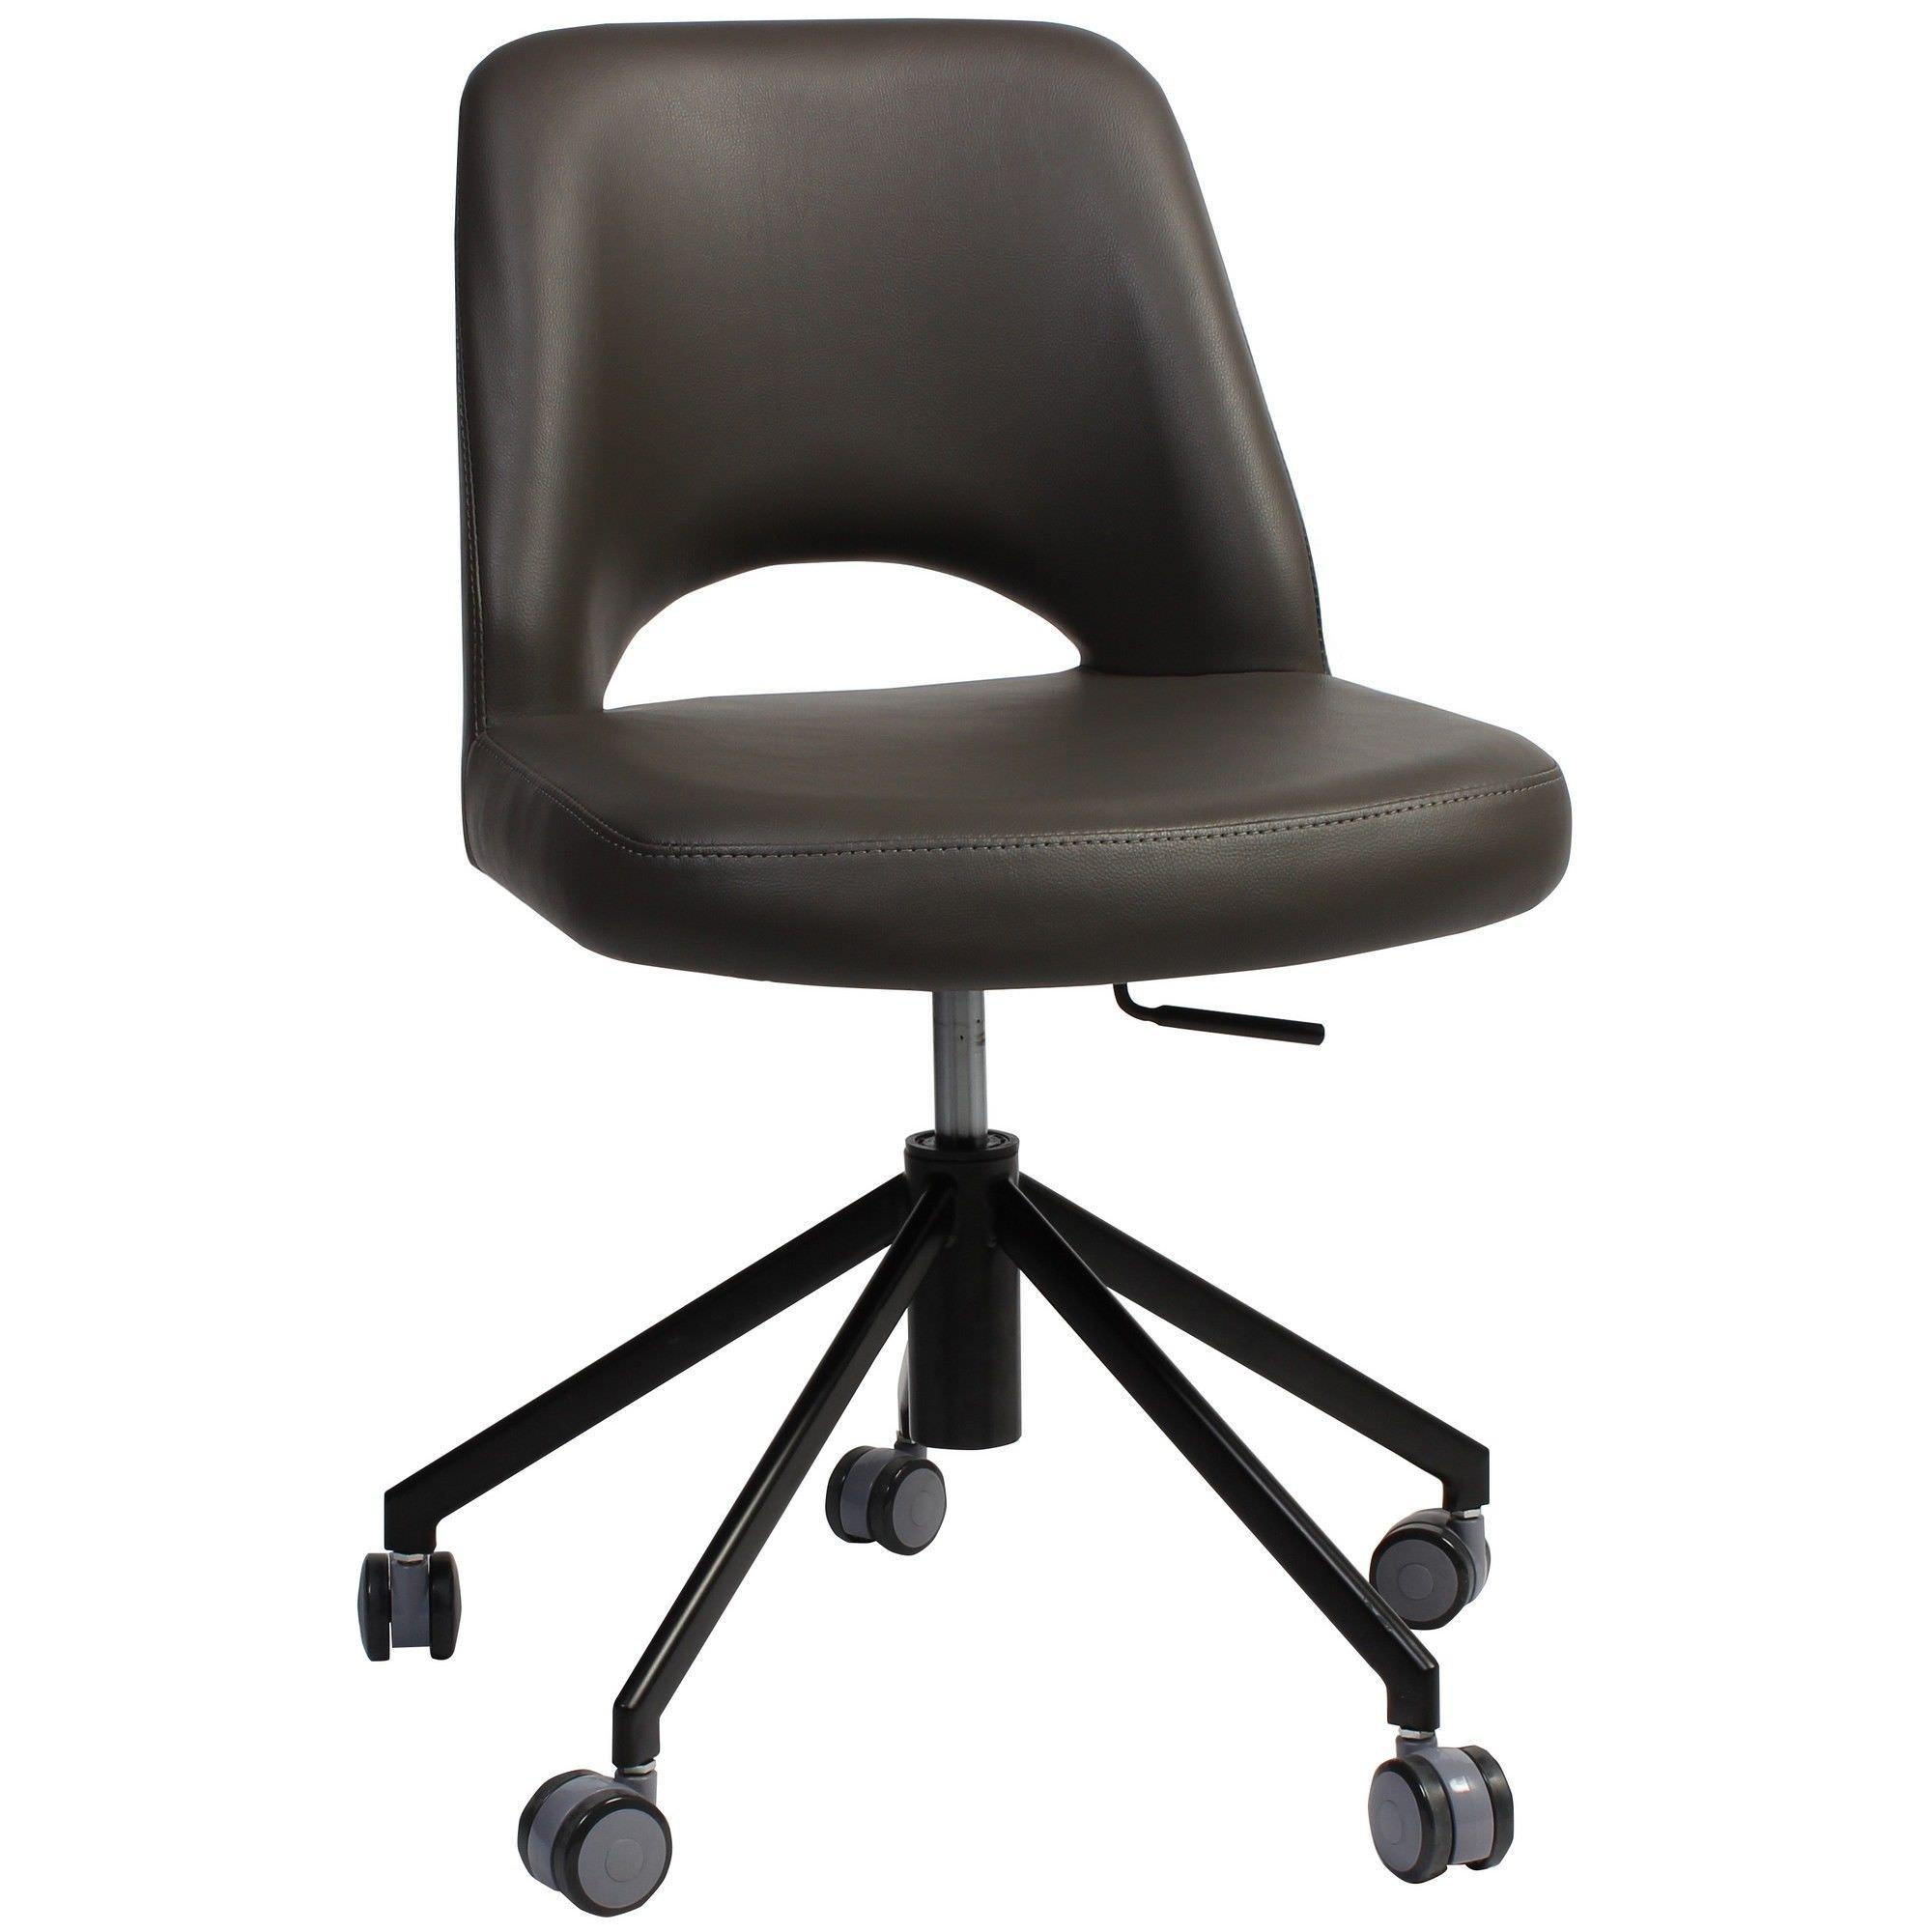 Albury Commercial Grade Gas Lift Vinyl Office Chair, Charcoal / Black